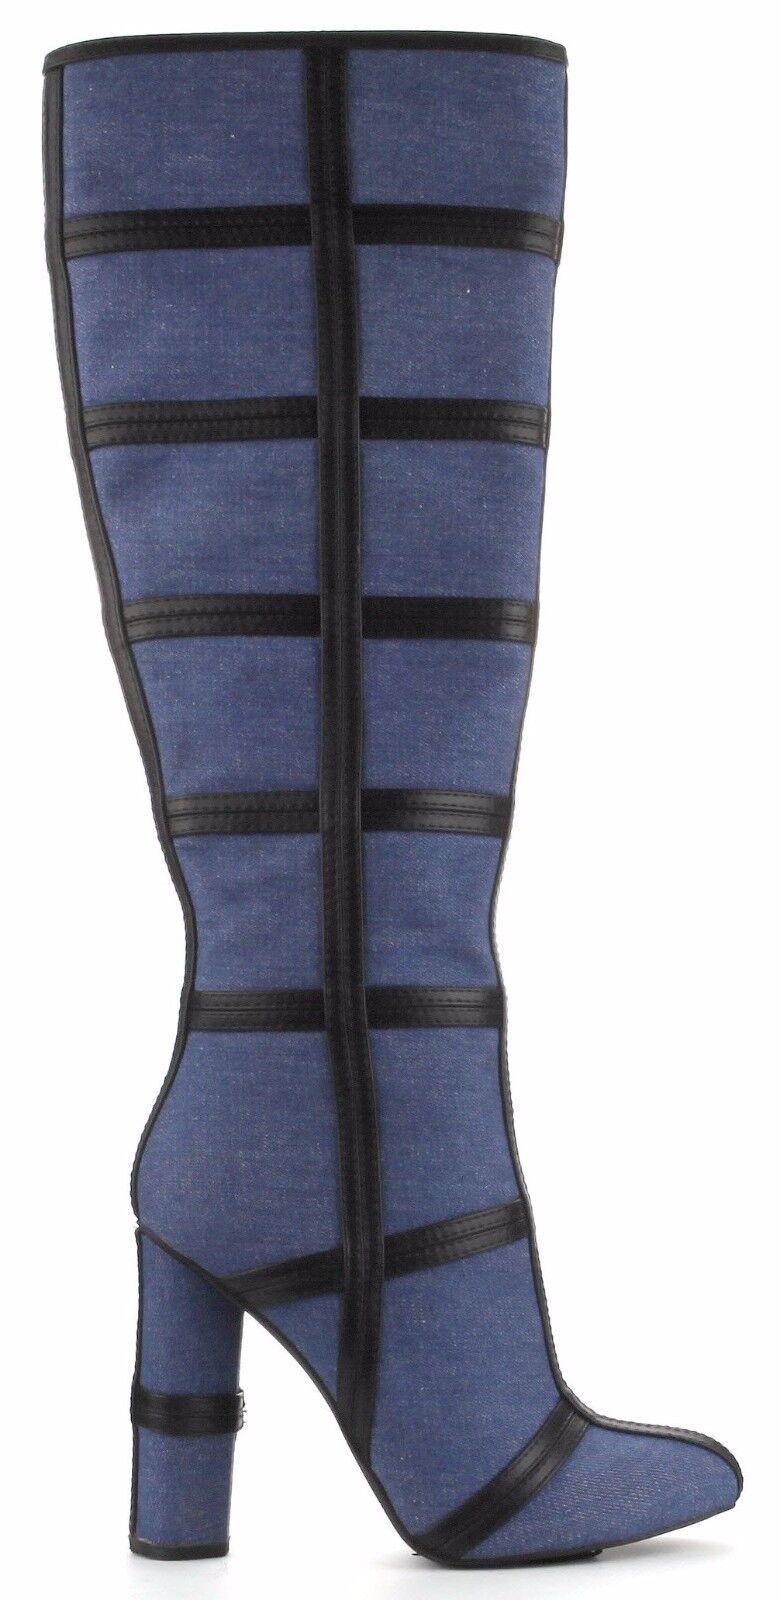 Maura-3 Knee High Denim Closed Toe Block Heel Boots Side Zipper  Blue